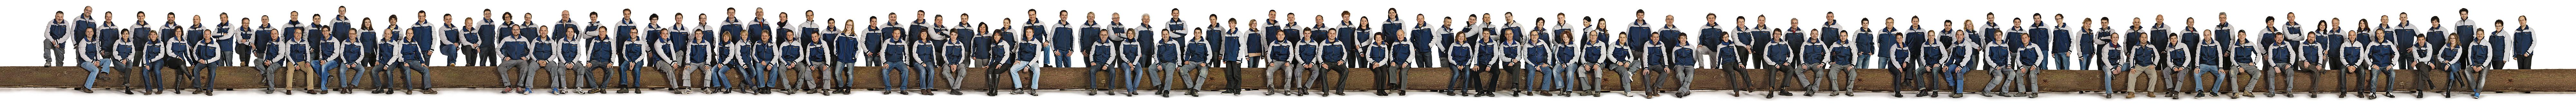 Renggli AG Holzbau _ Team